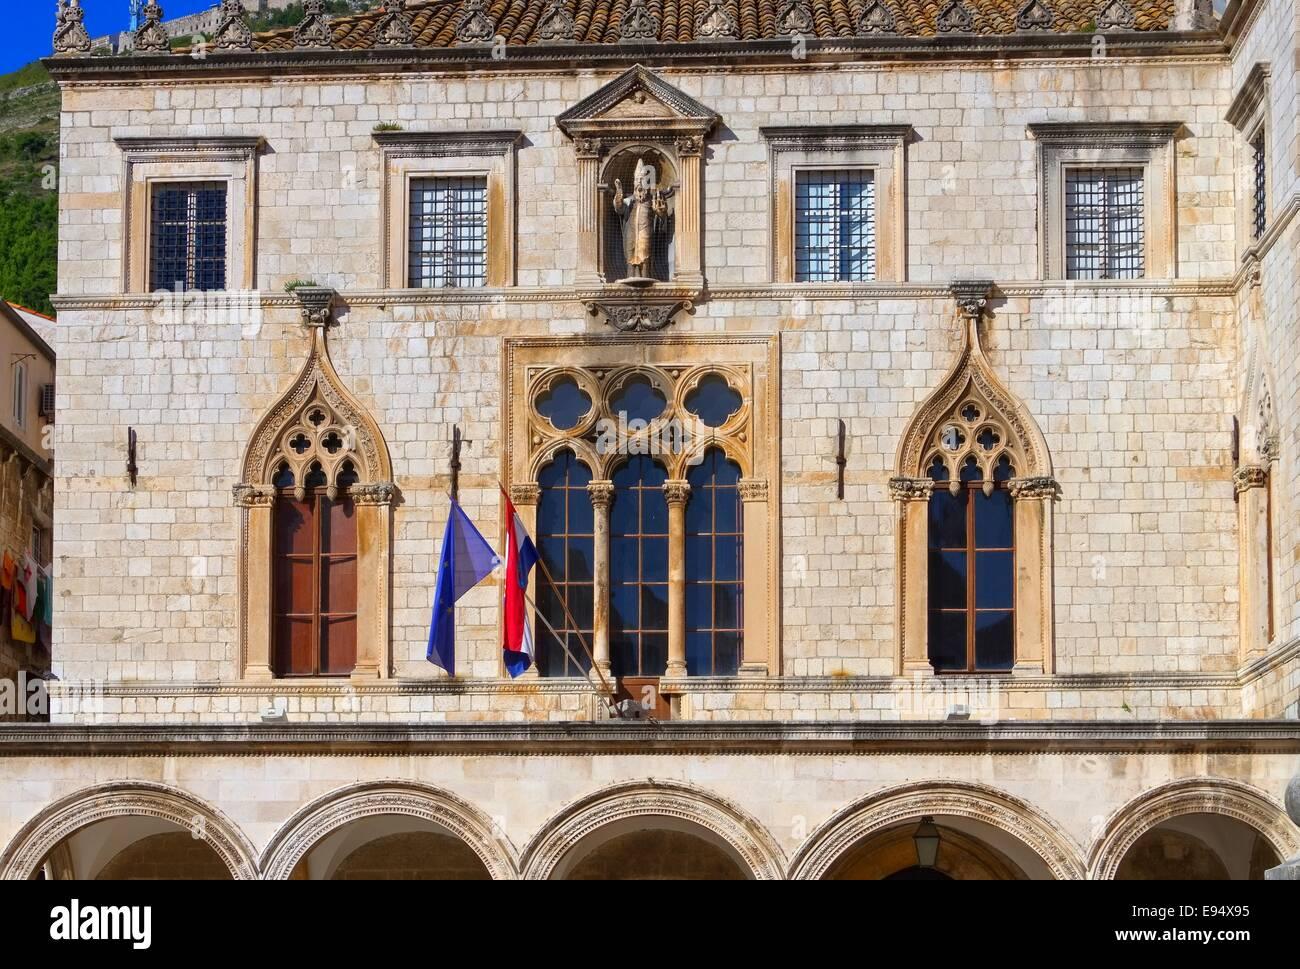 Dubrovnik Sponza Palast - Dubrovnik Sponza Palace 01 - Stock Image